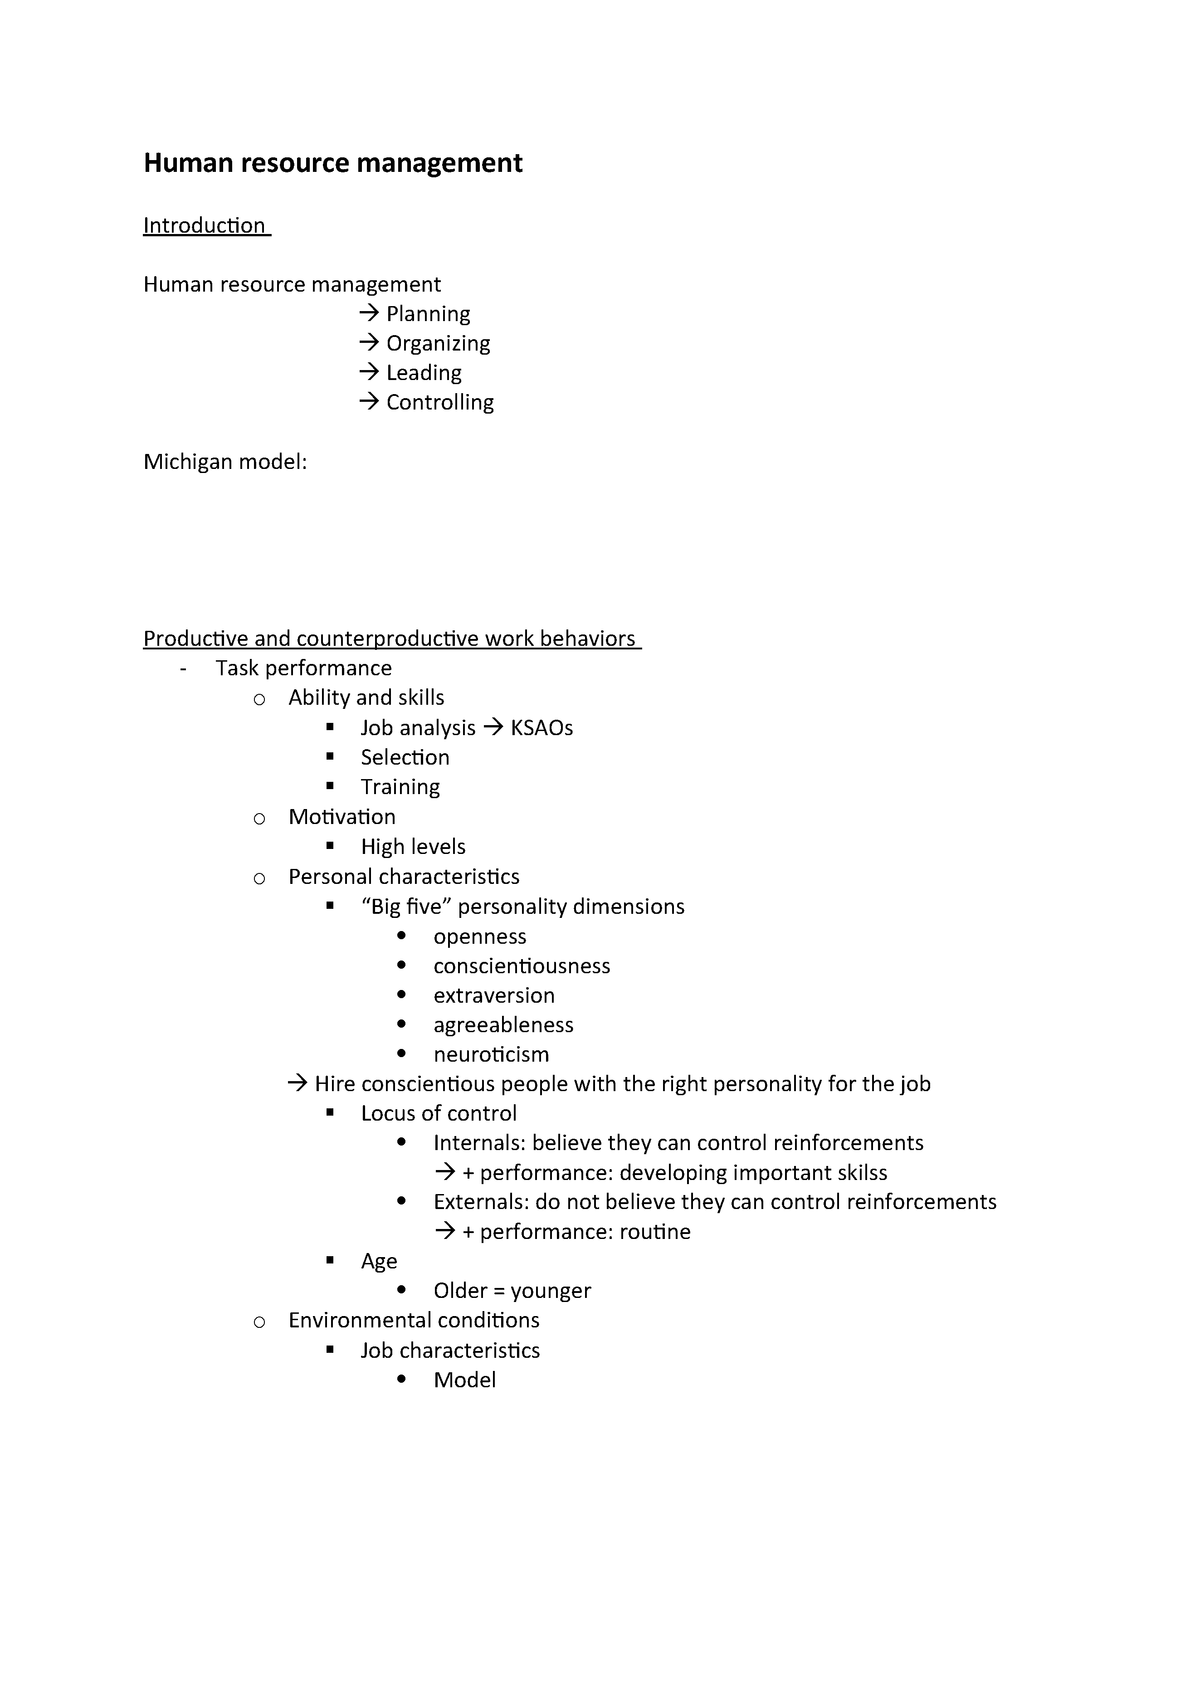 Human resource management - 3709 - StuDocu